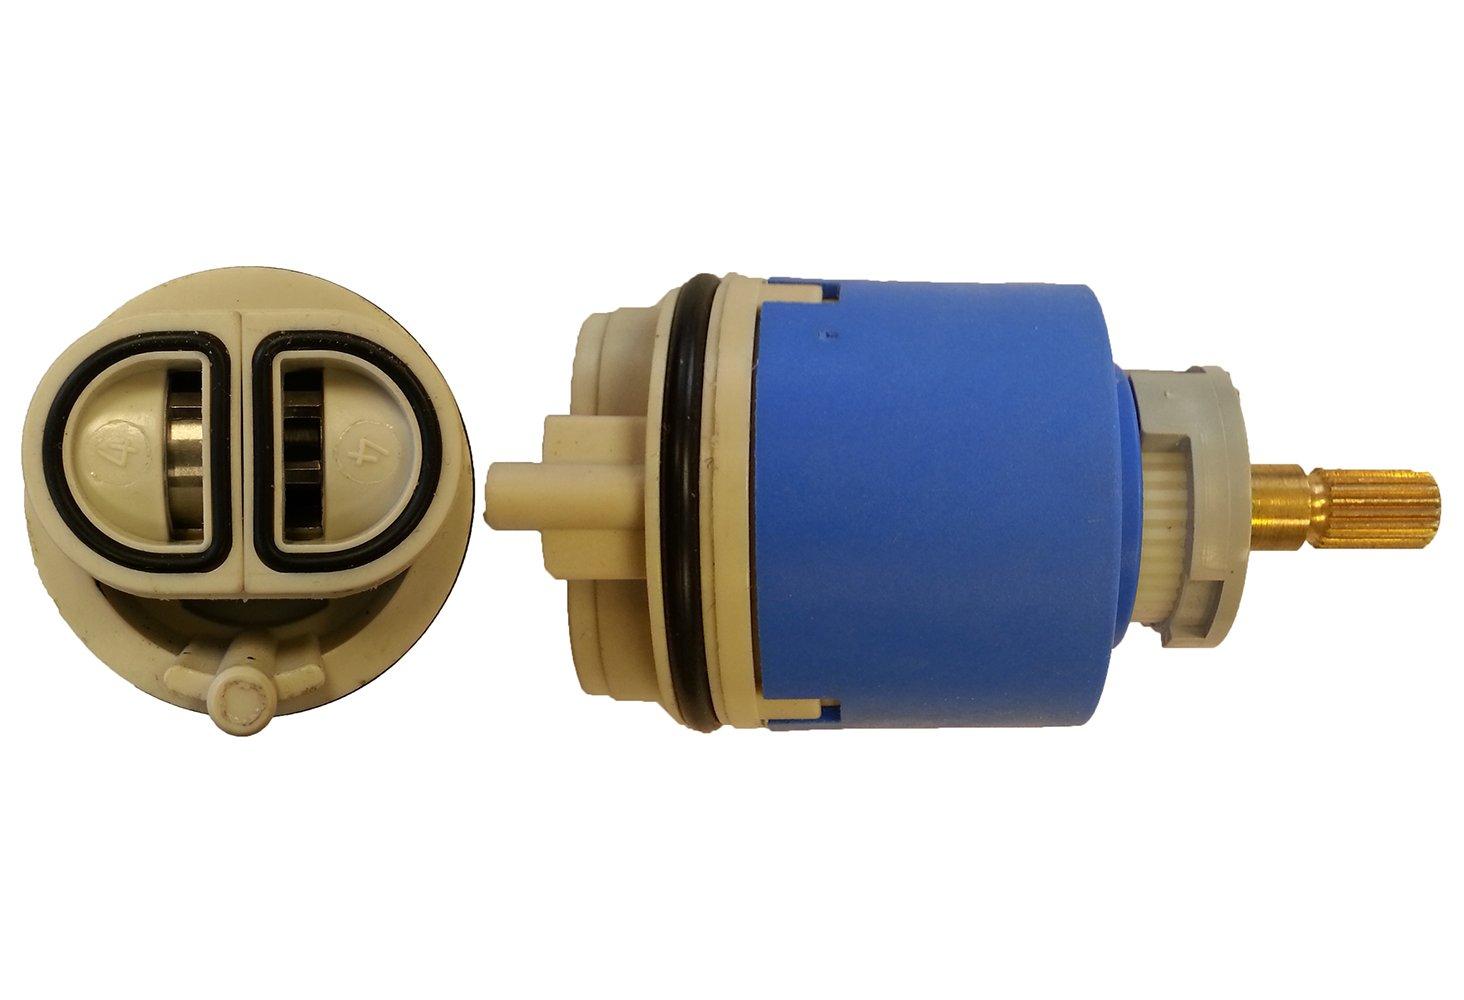 CFG Single Lever Pressure Balance Ceramic Cartridge by Binford (Image #1)